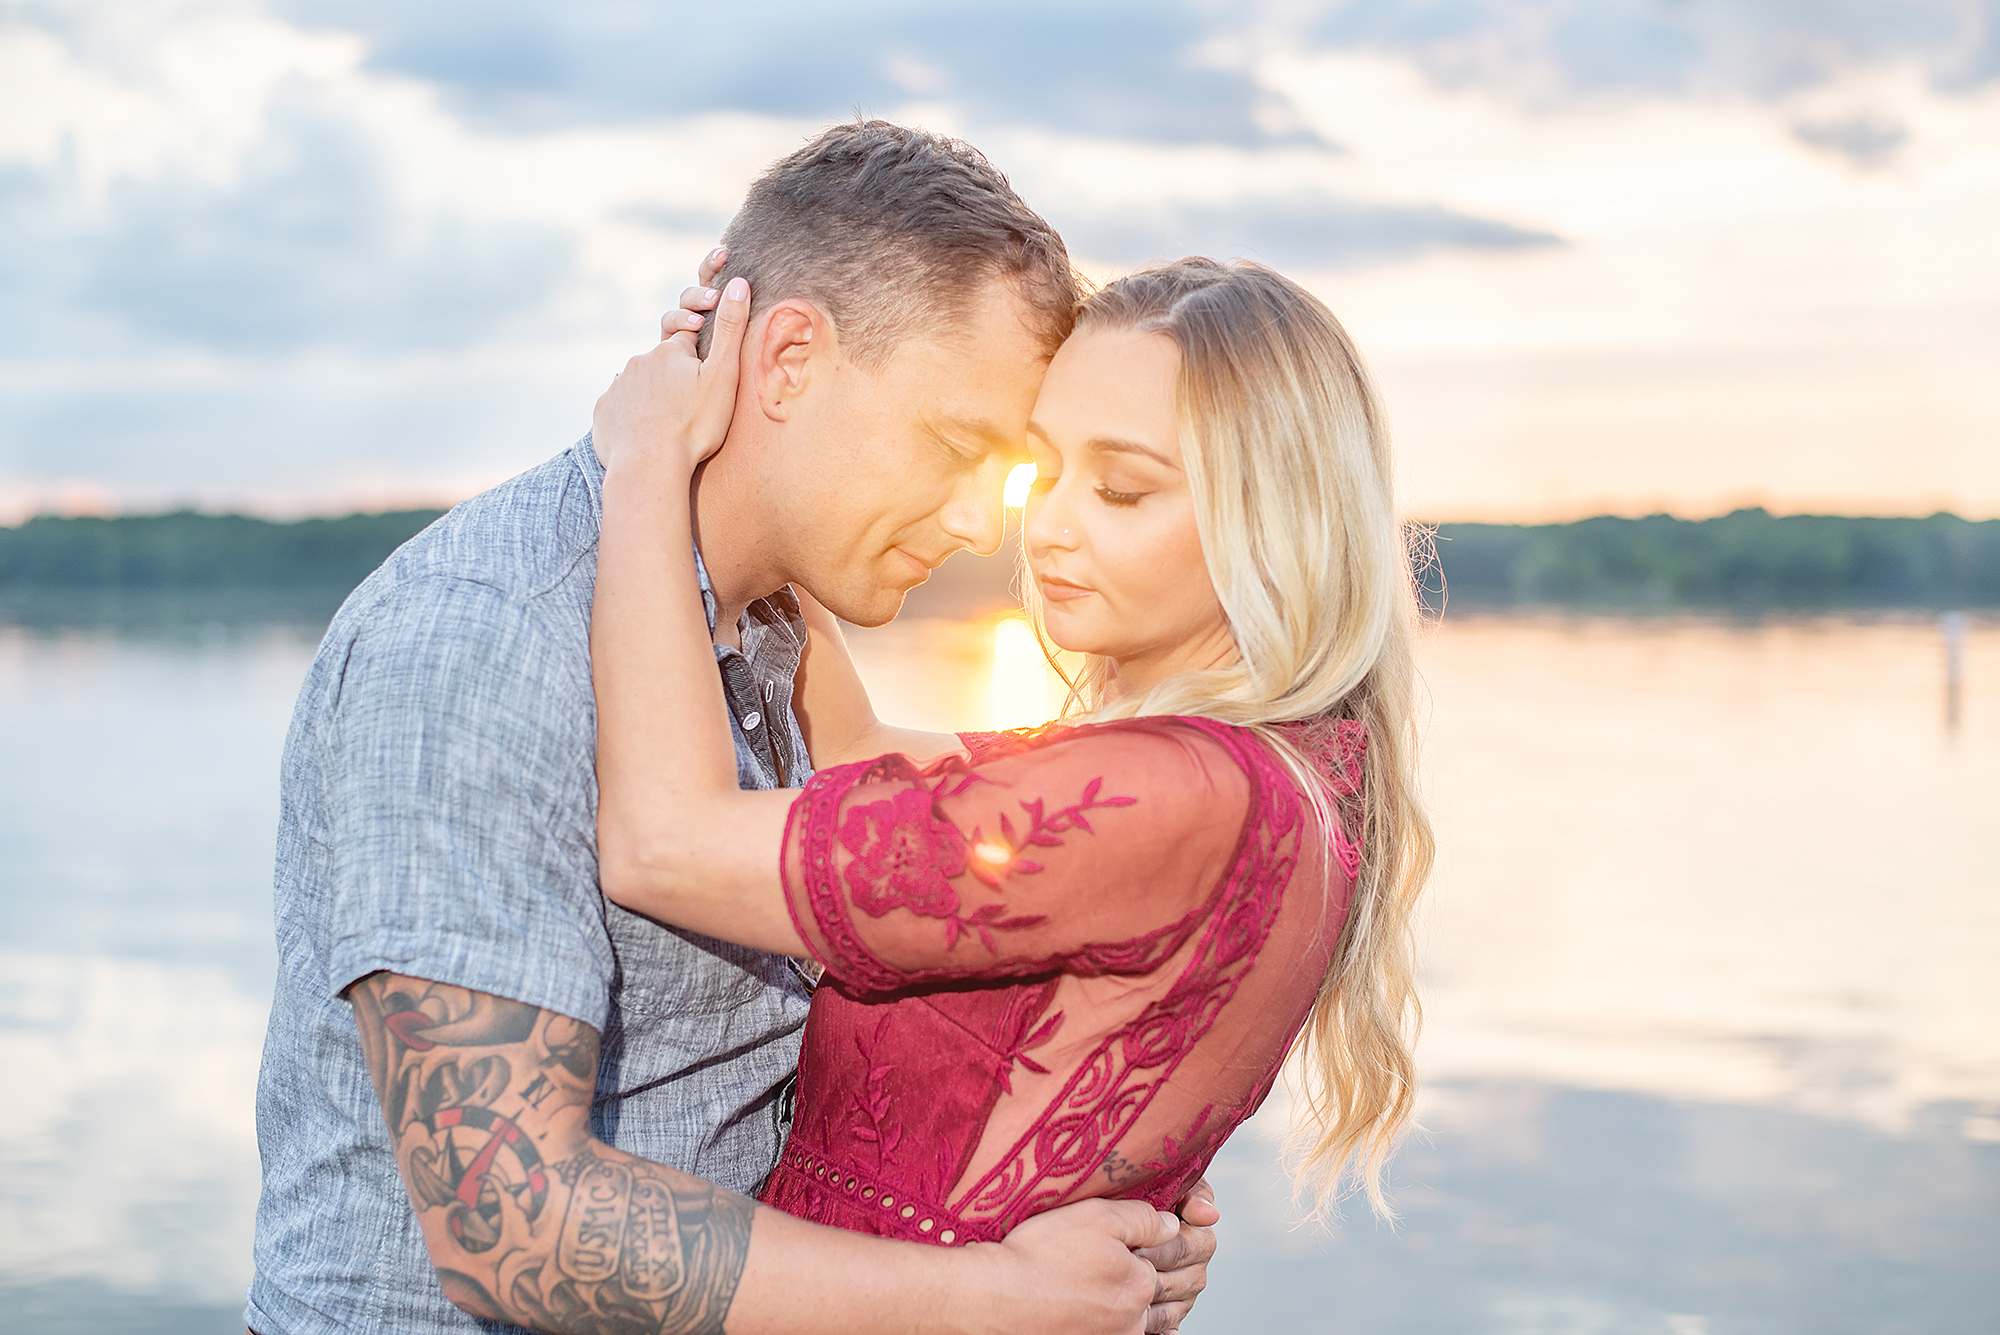 Lindsay-Adkins-Photography-Michigan-Wedding-Photographer-Page-David-Kensington-Metro-Park-Milford-Michigan-Blog-8